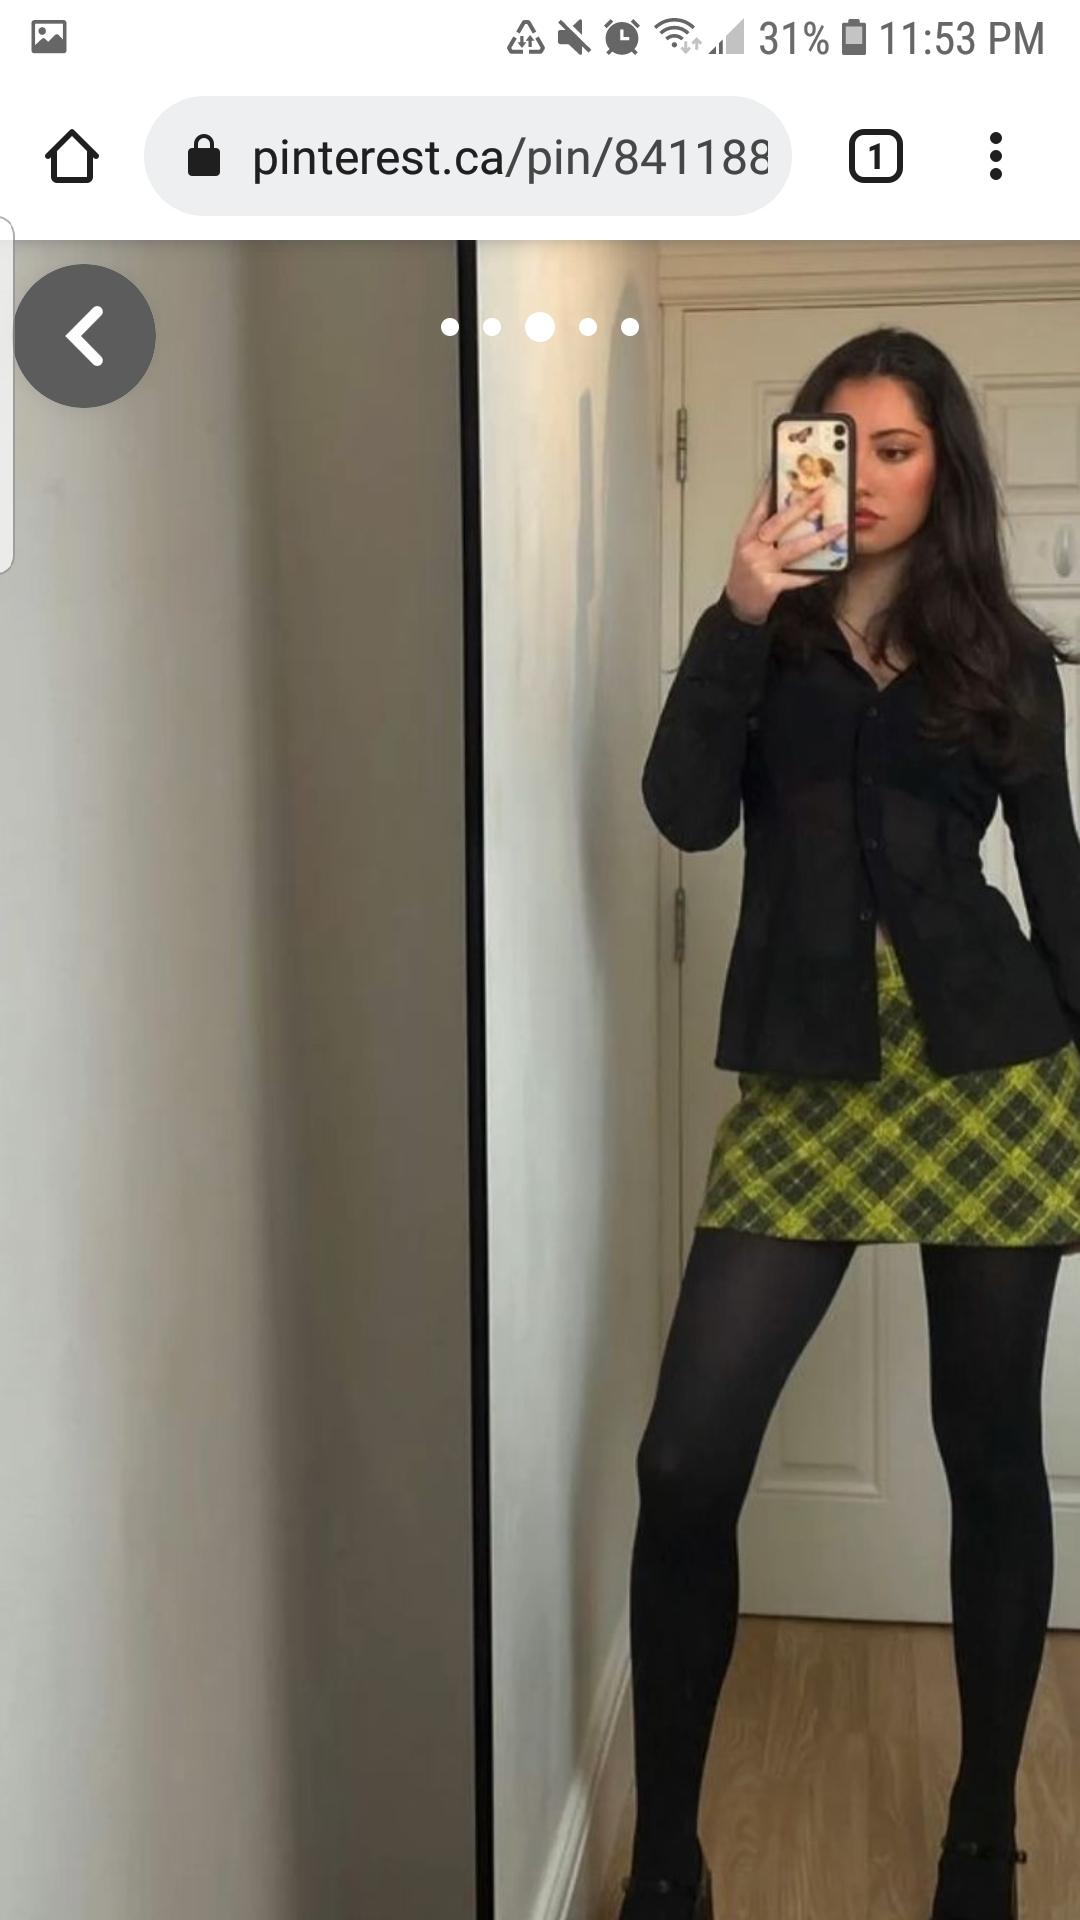 shorts vintage checkered tartan plaid skirt